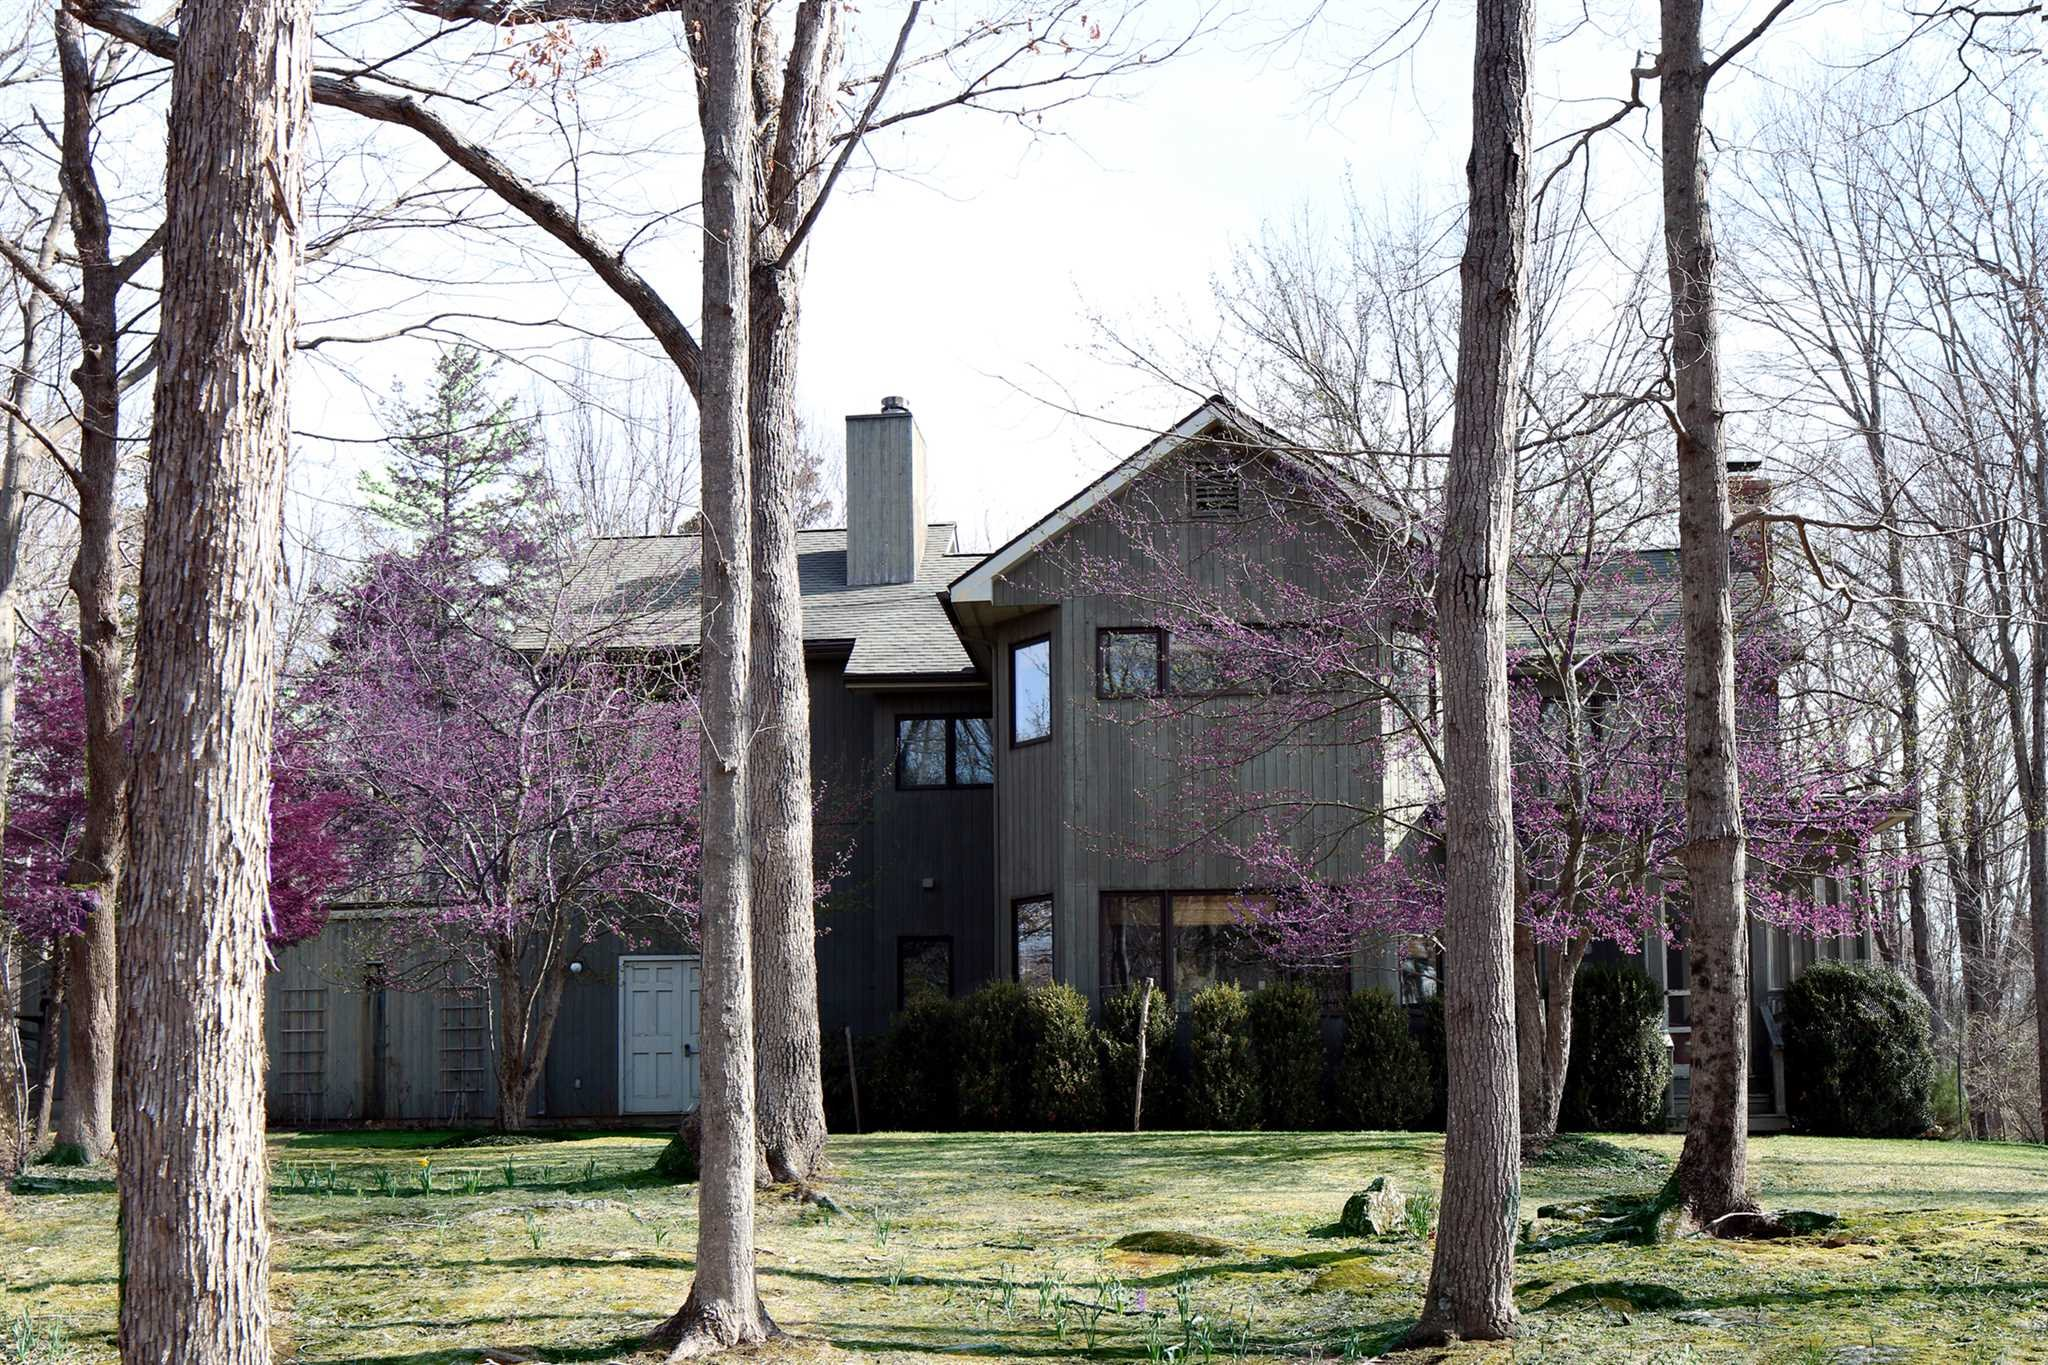 Single Family Home for Sale at 15 TROUTBECK CRESCENT 15 TROUTBECK CRESCENT Amenia, New York 12546 United States